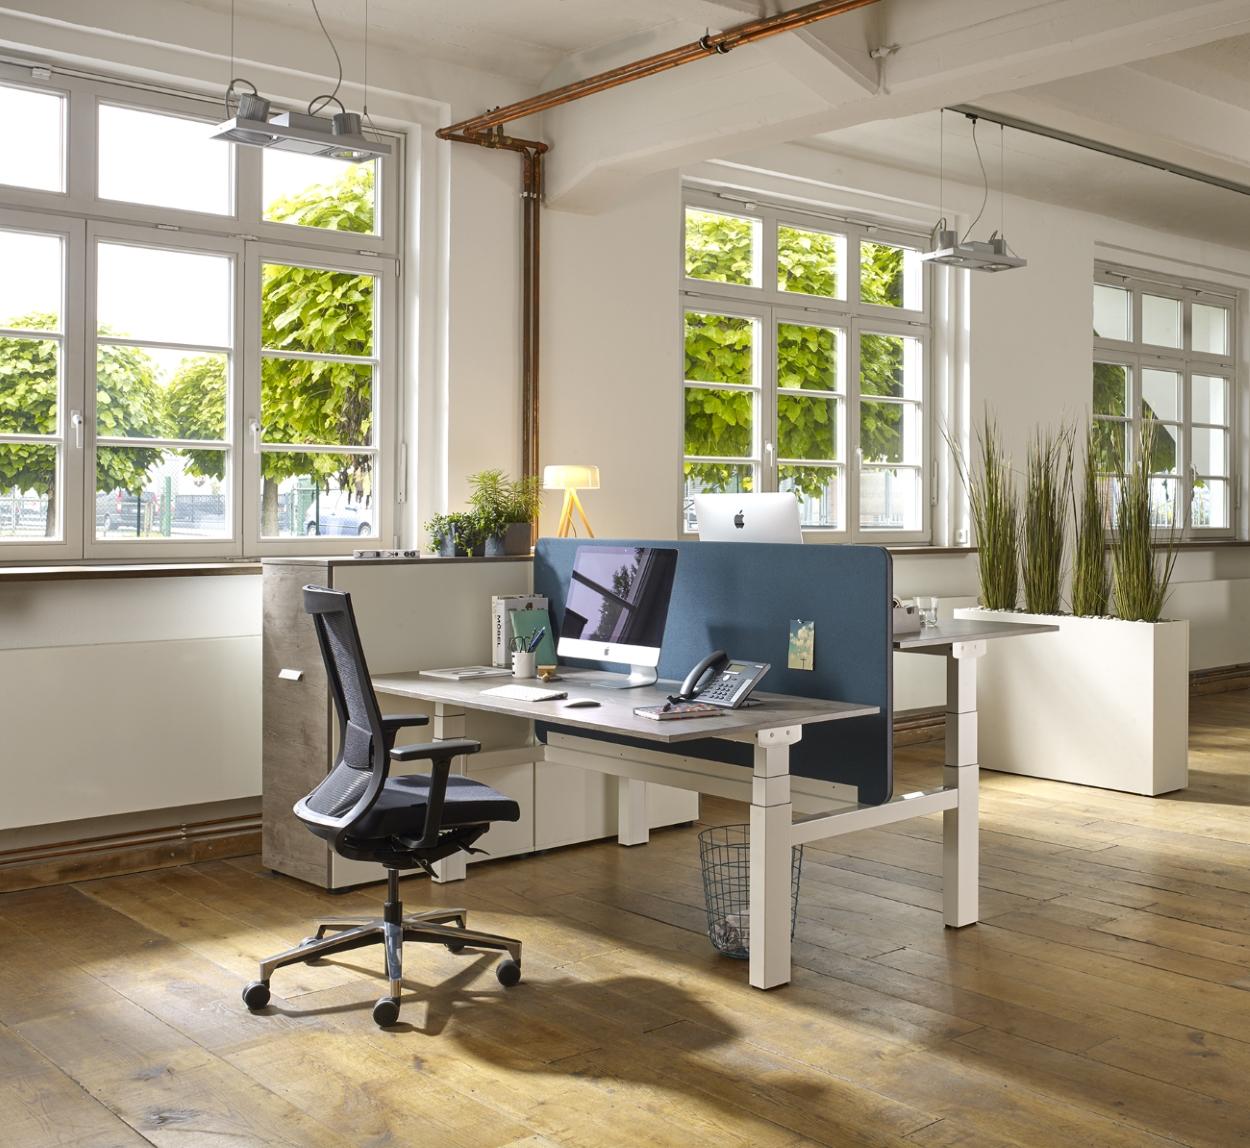 Februe_Arbeitsplatz_Active_036